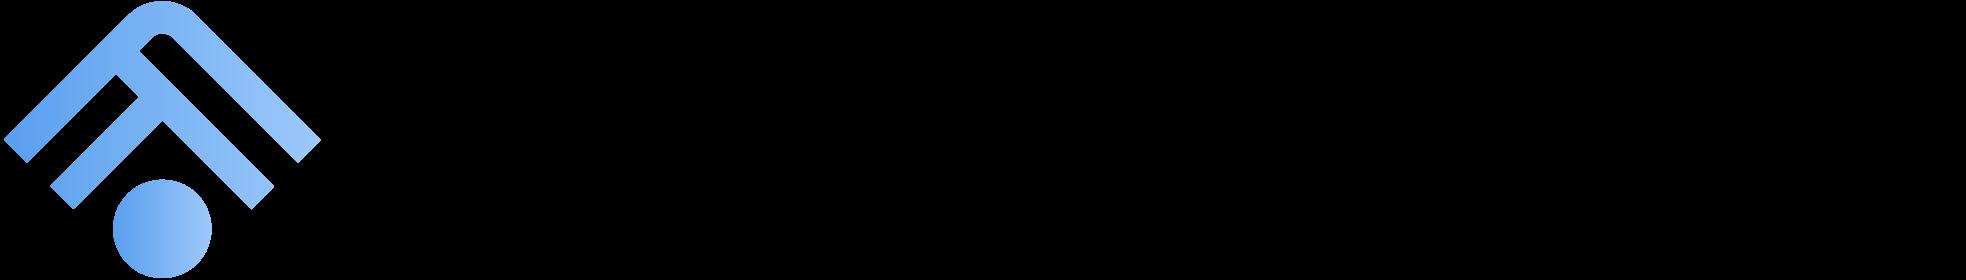 Foundertribes logo